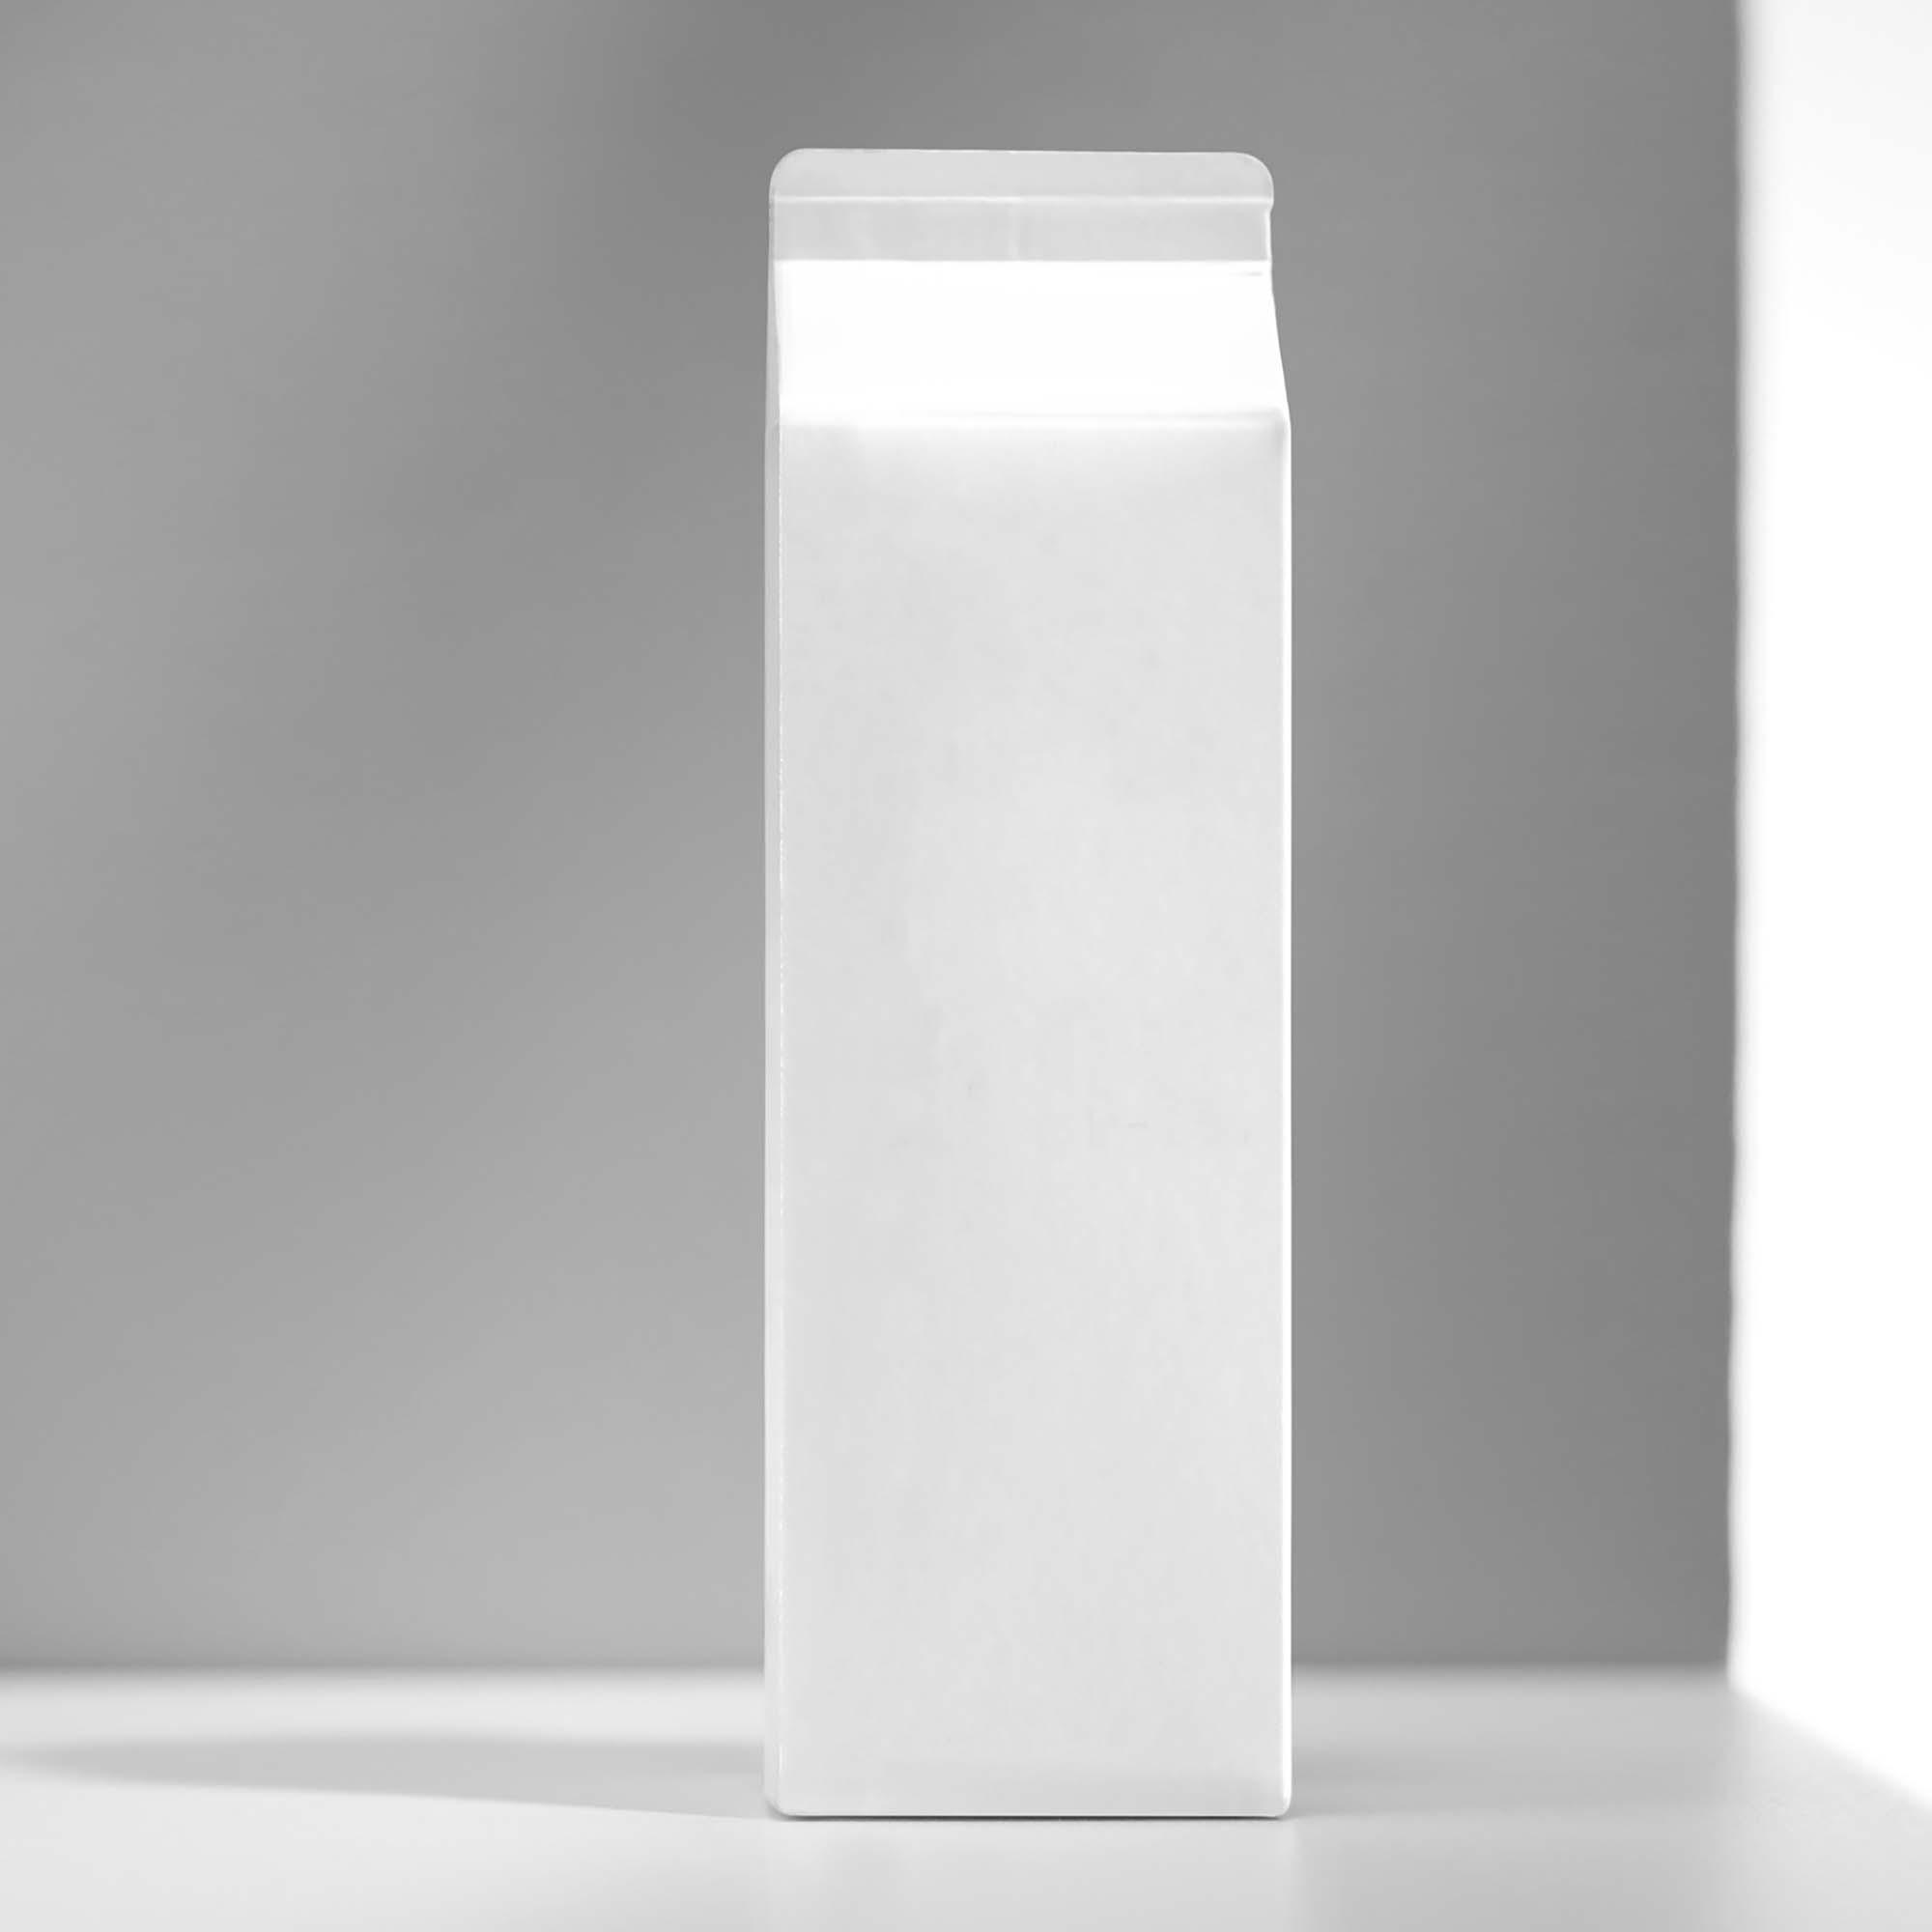 Milk Carton Mockup 2